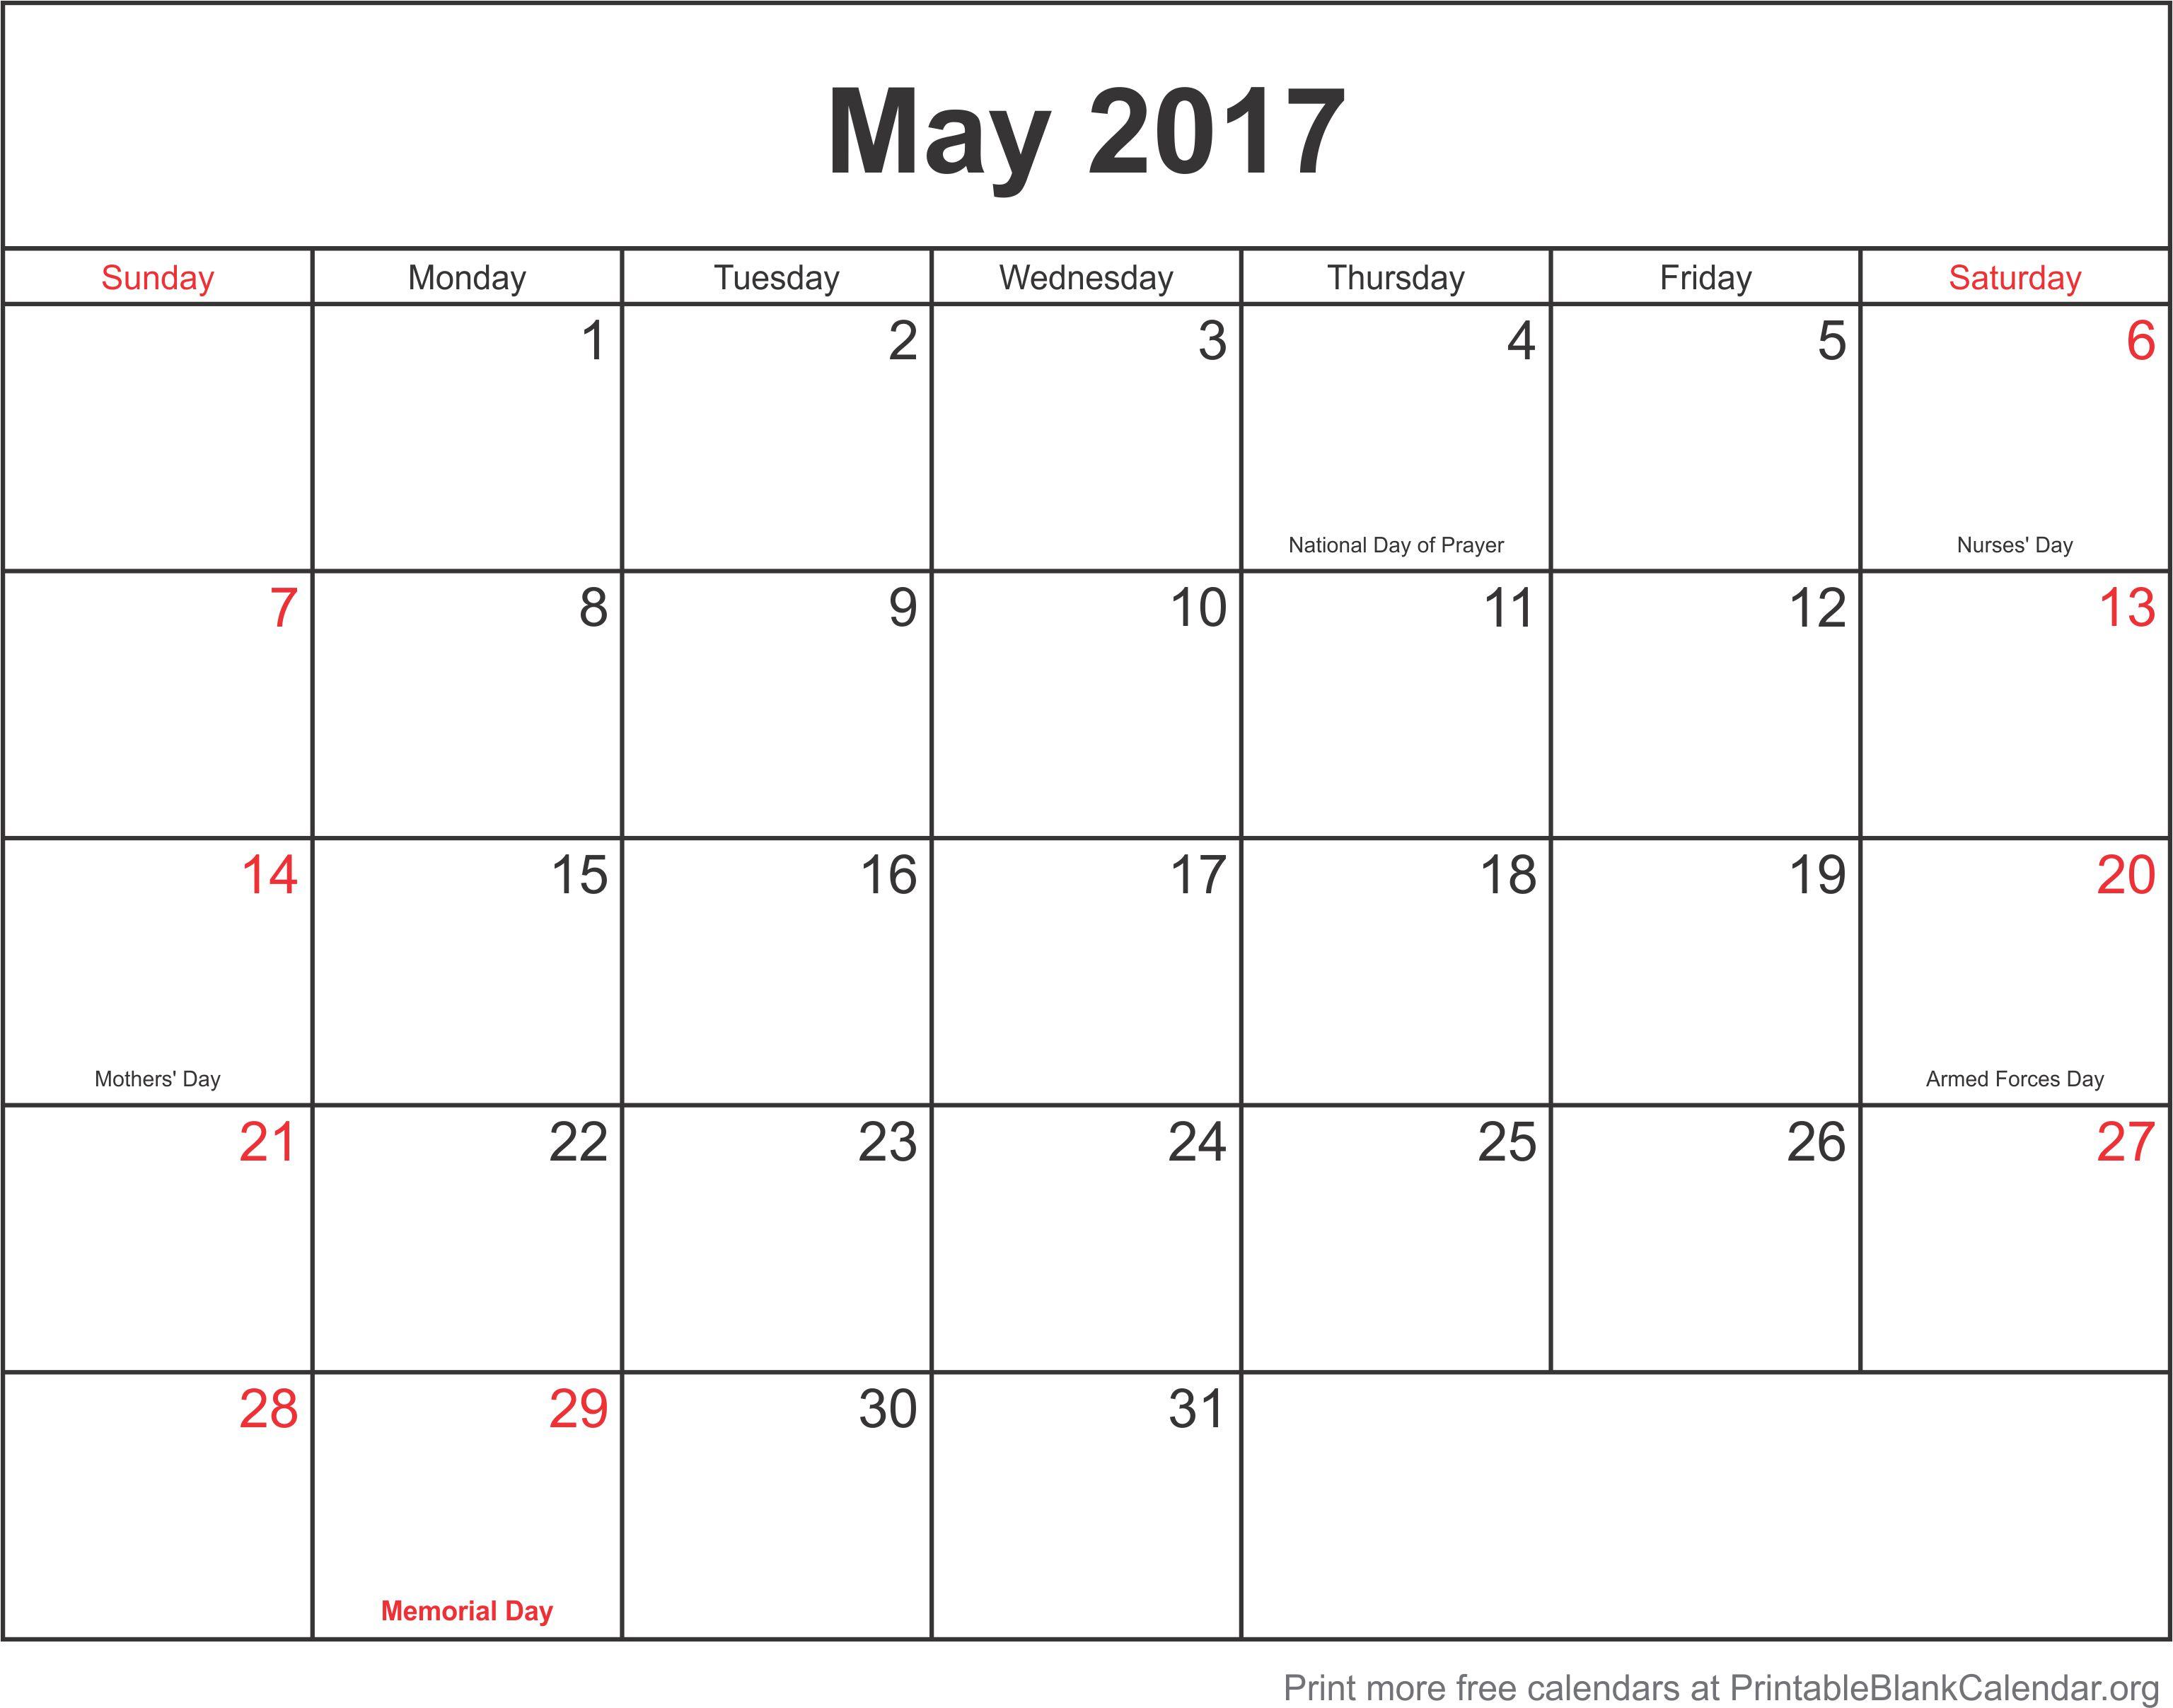 May 2017 printable calendar template - Printable Blank Calendar.org